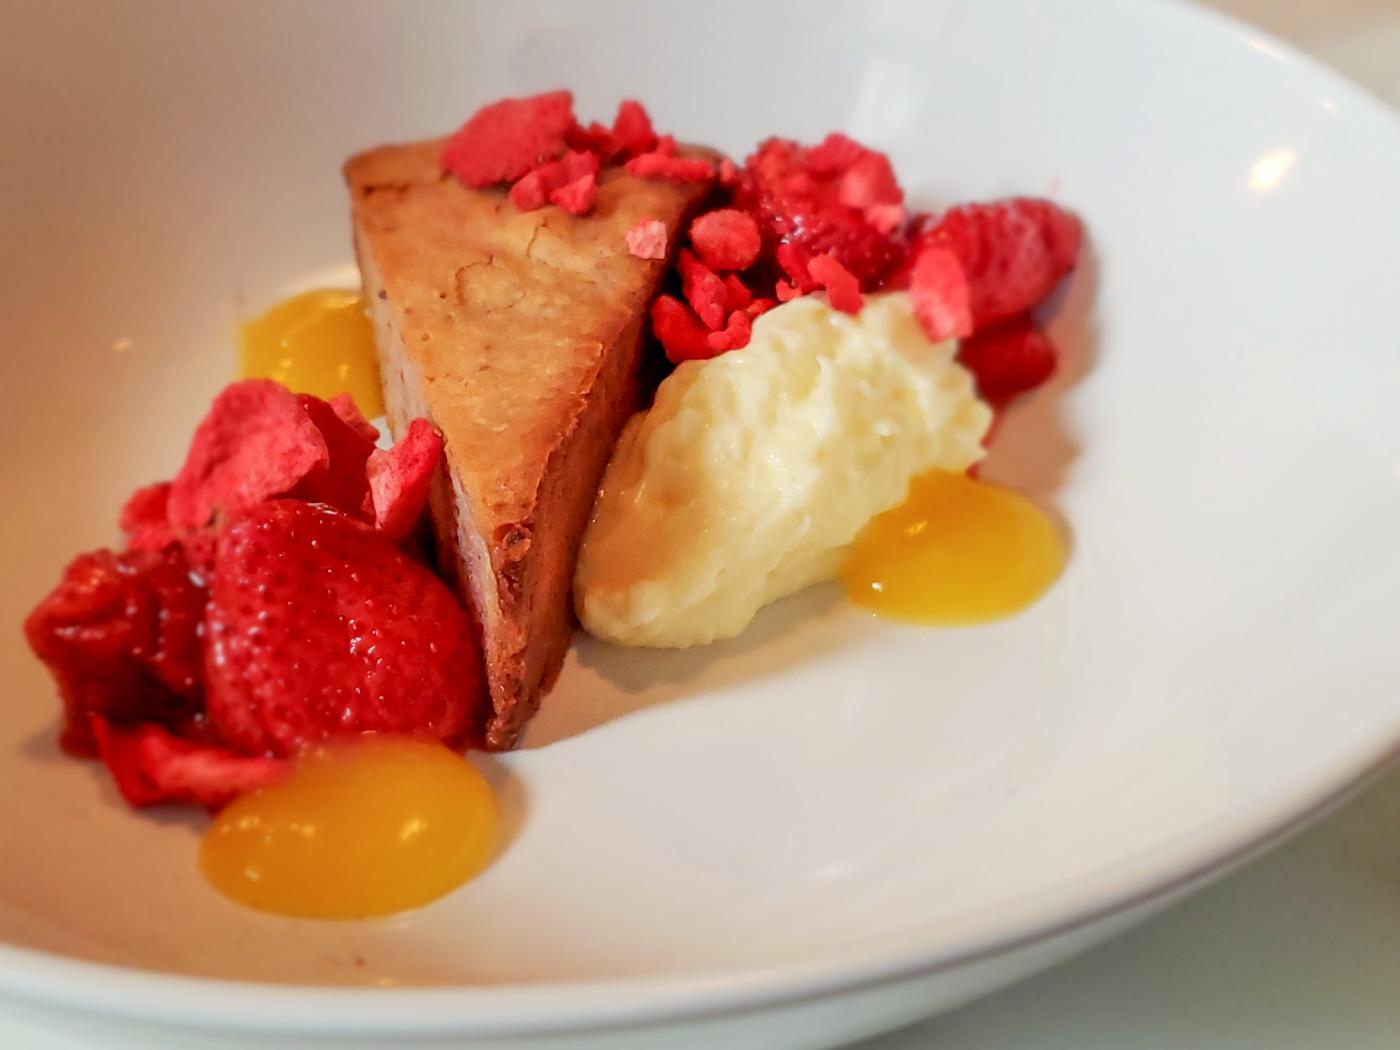 Strawberry Dessert at Rex1516